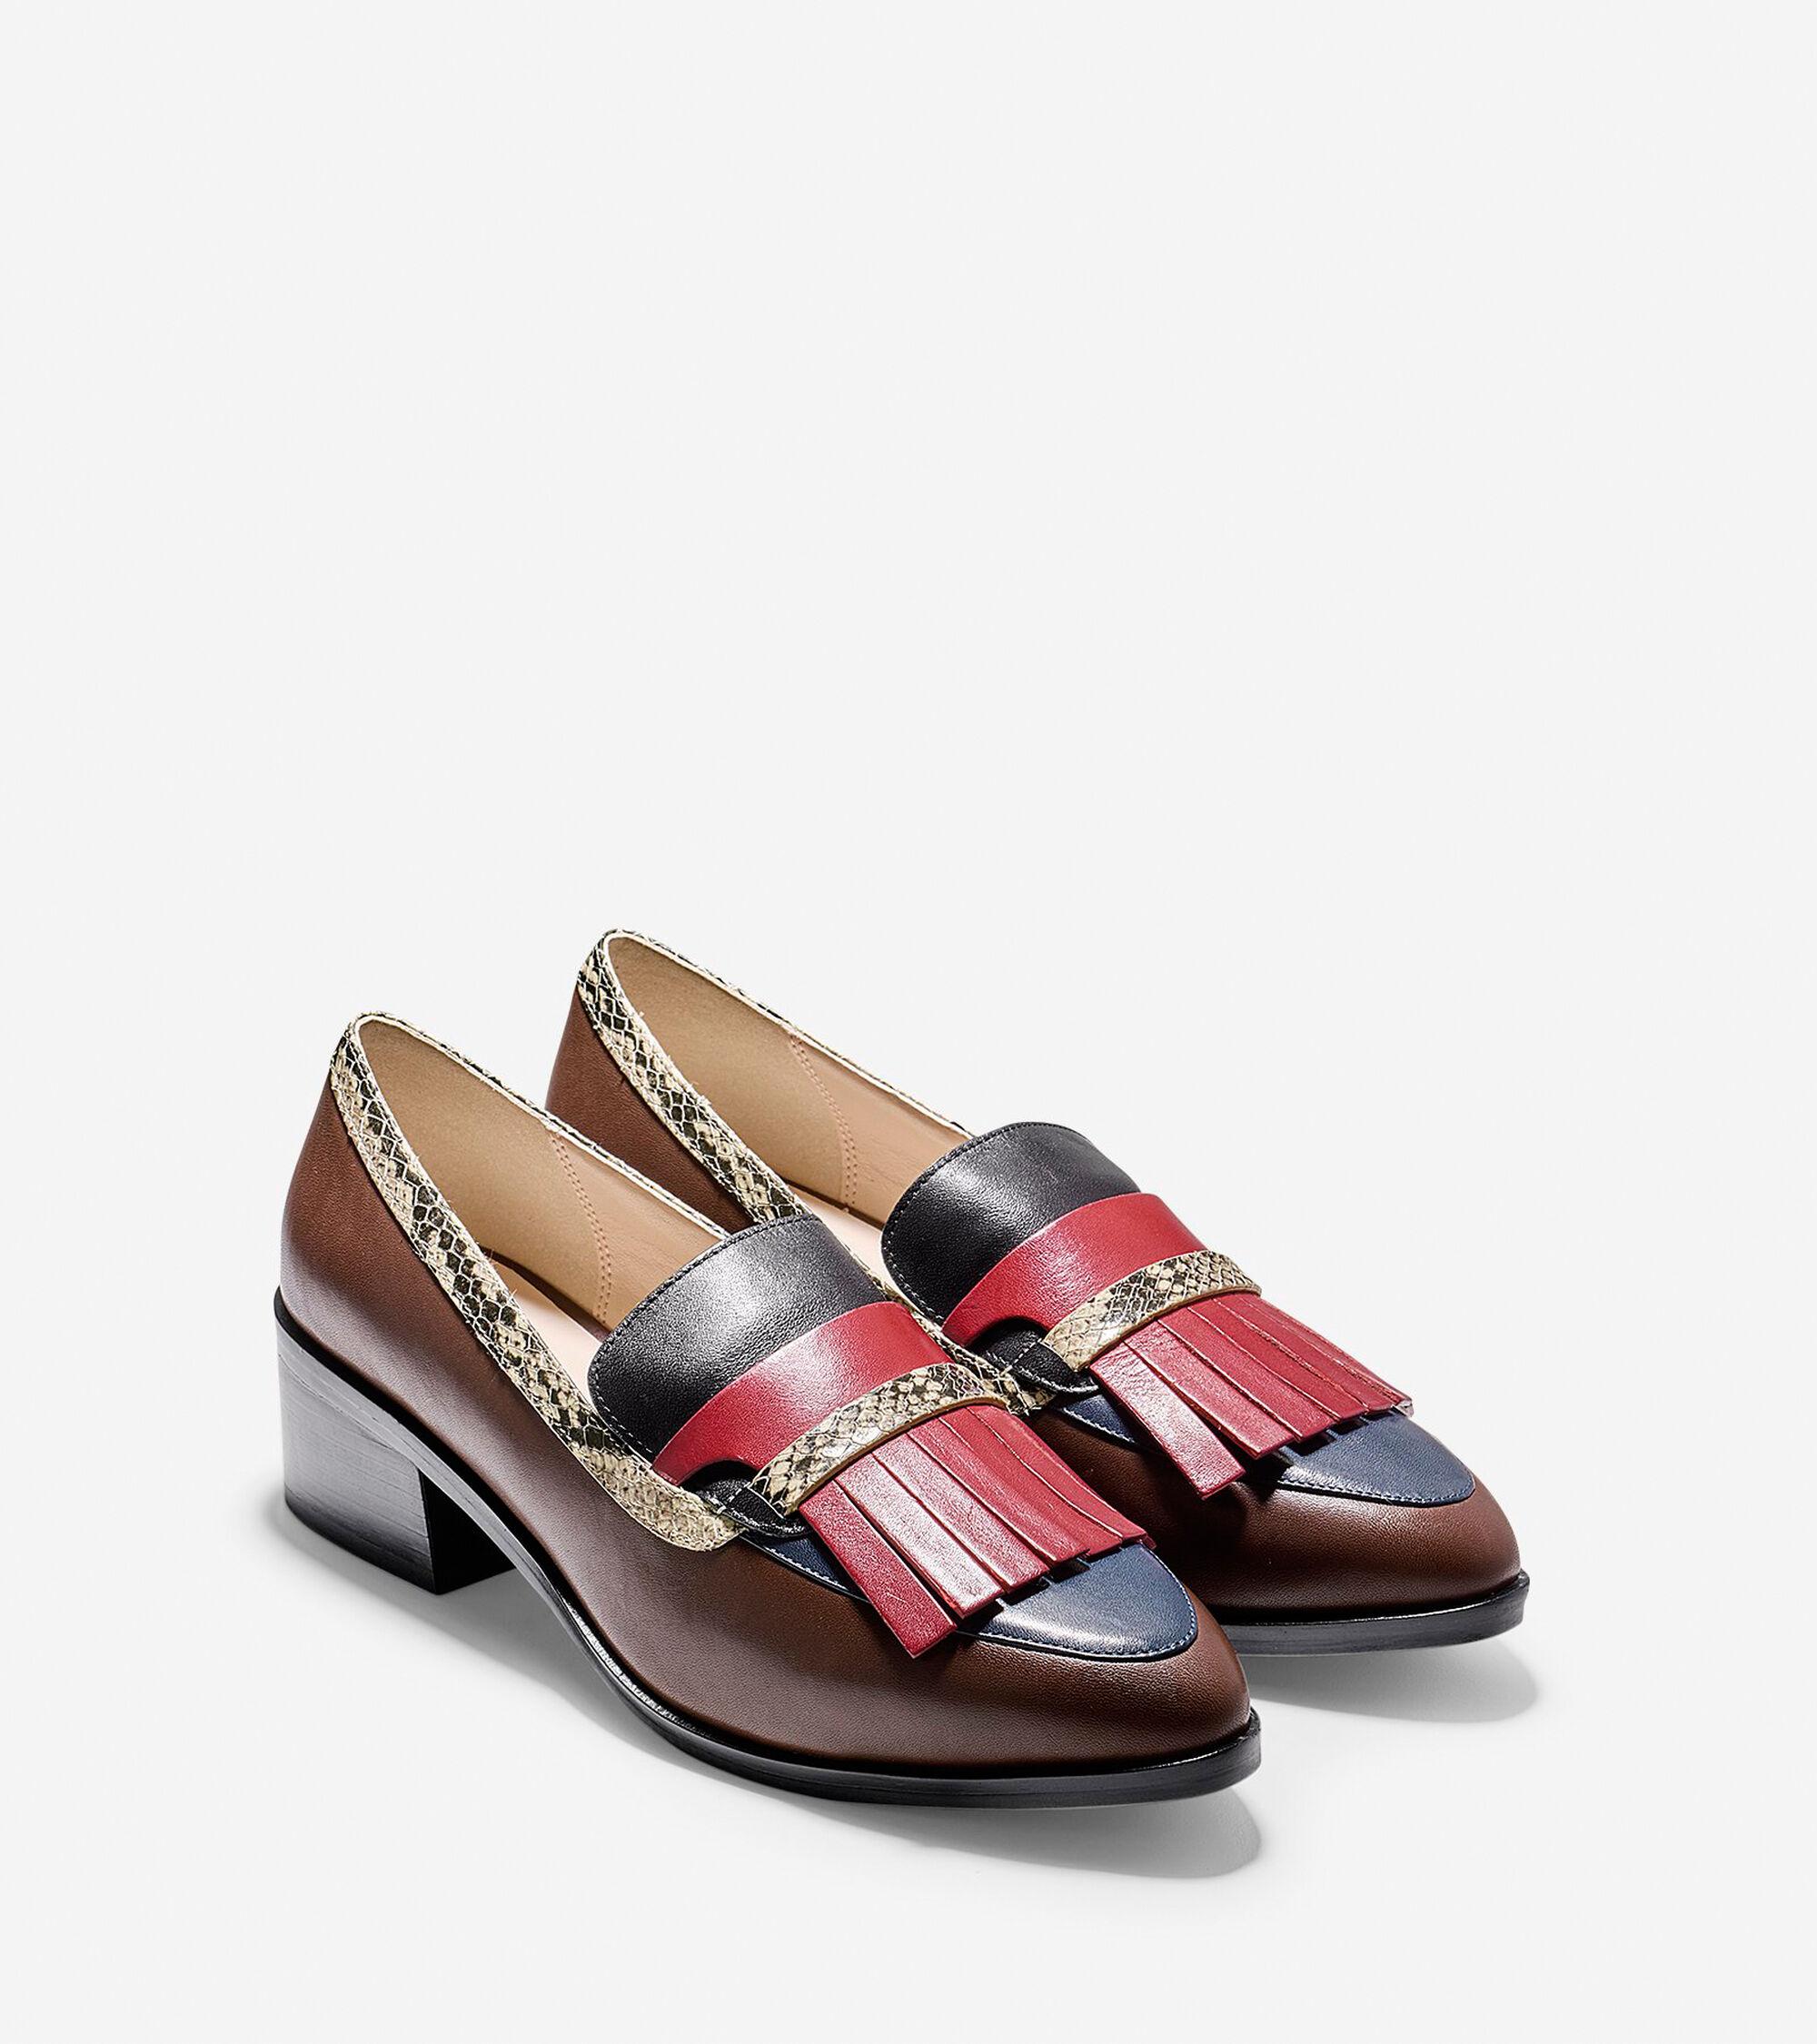 1d55cfab64e Women s Margarite Loafers in Chestnut-Blue-Black-Roccia Python ...